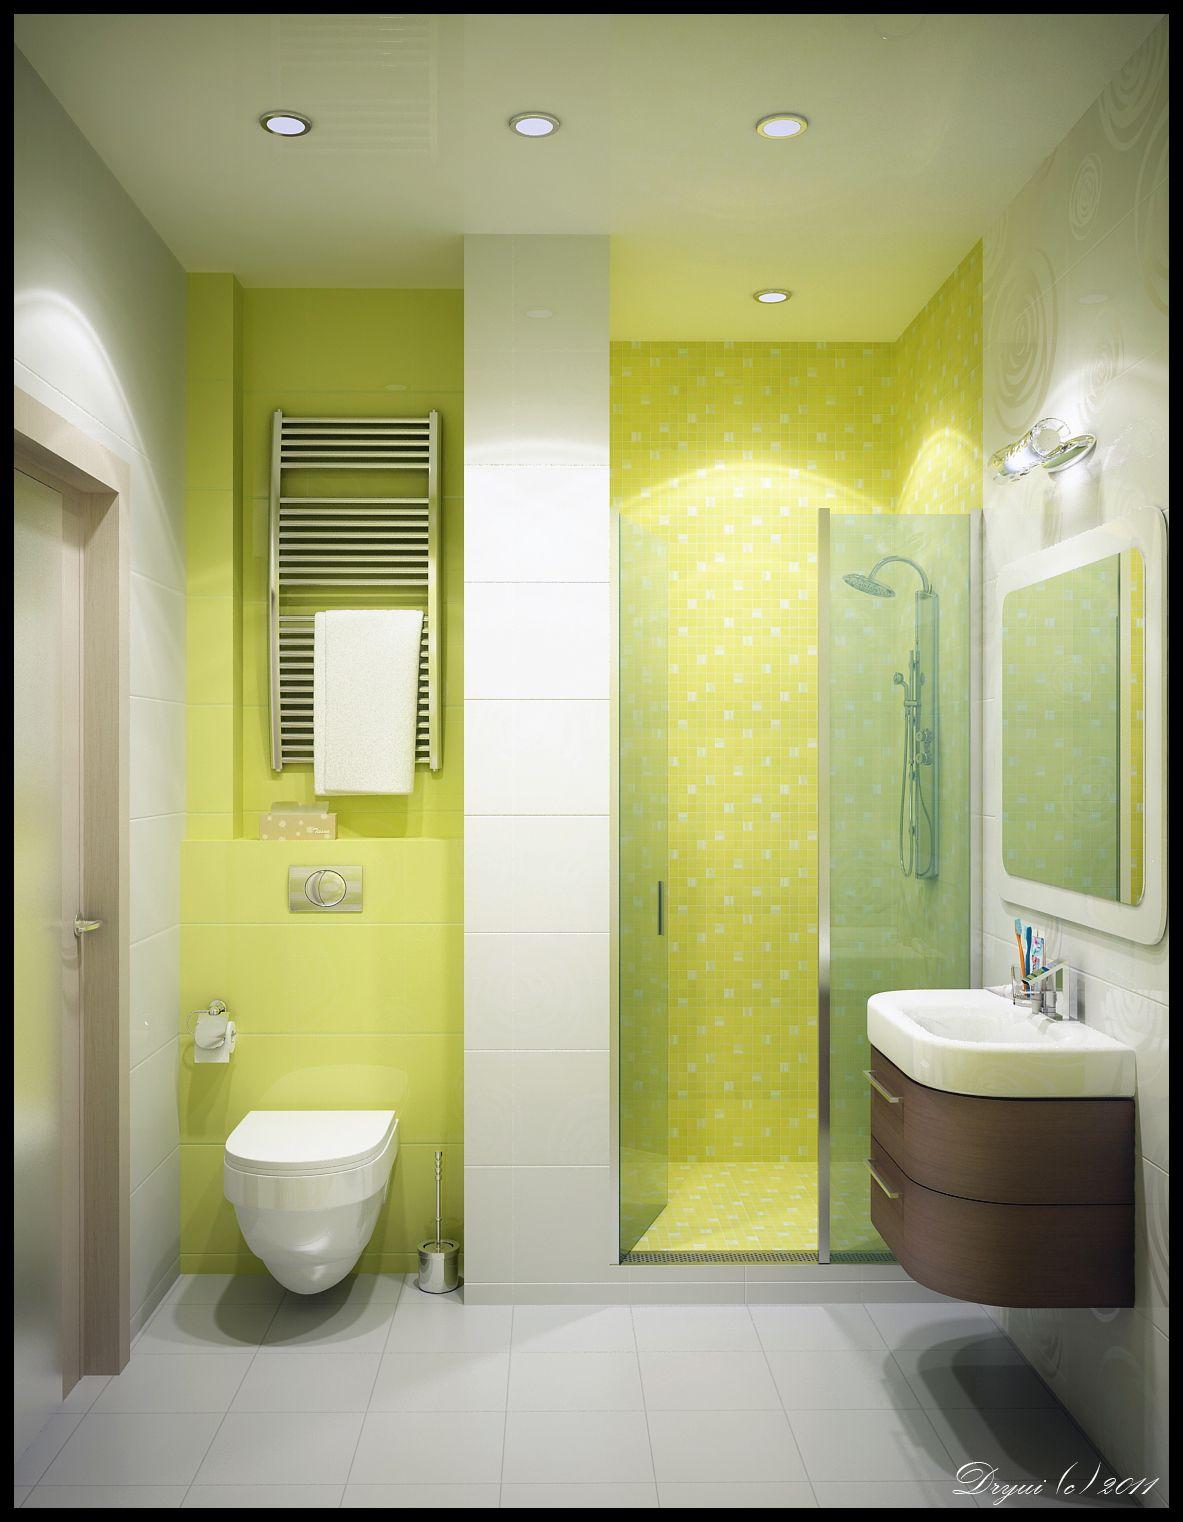 An Efficient Small Bathroom. | Bathrooms | Pinterest | Small ...